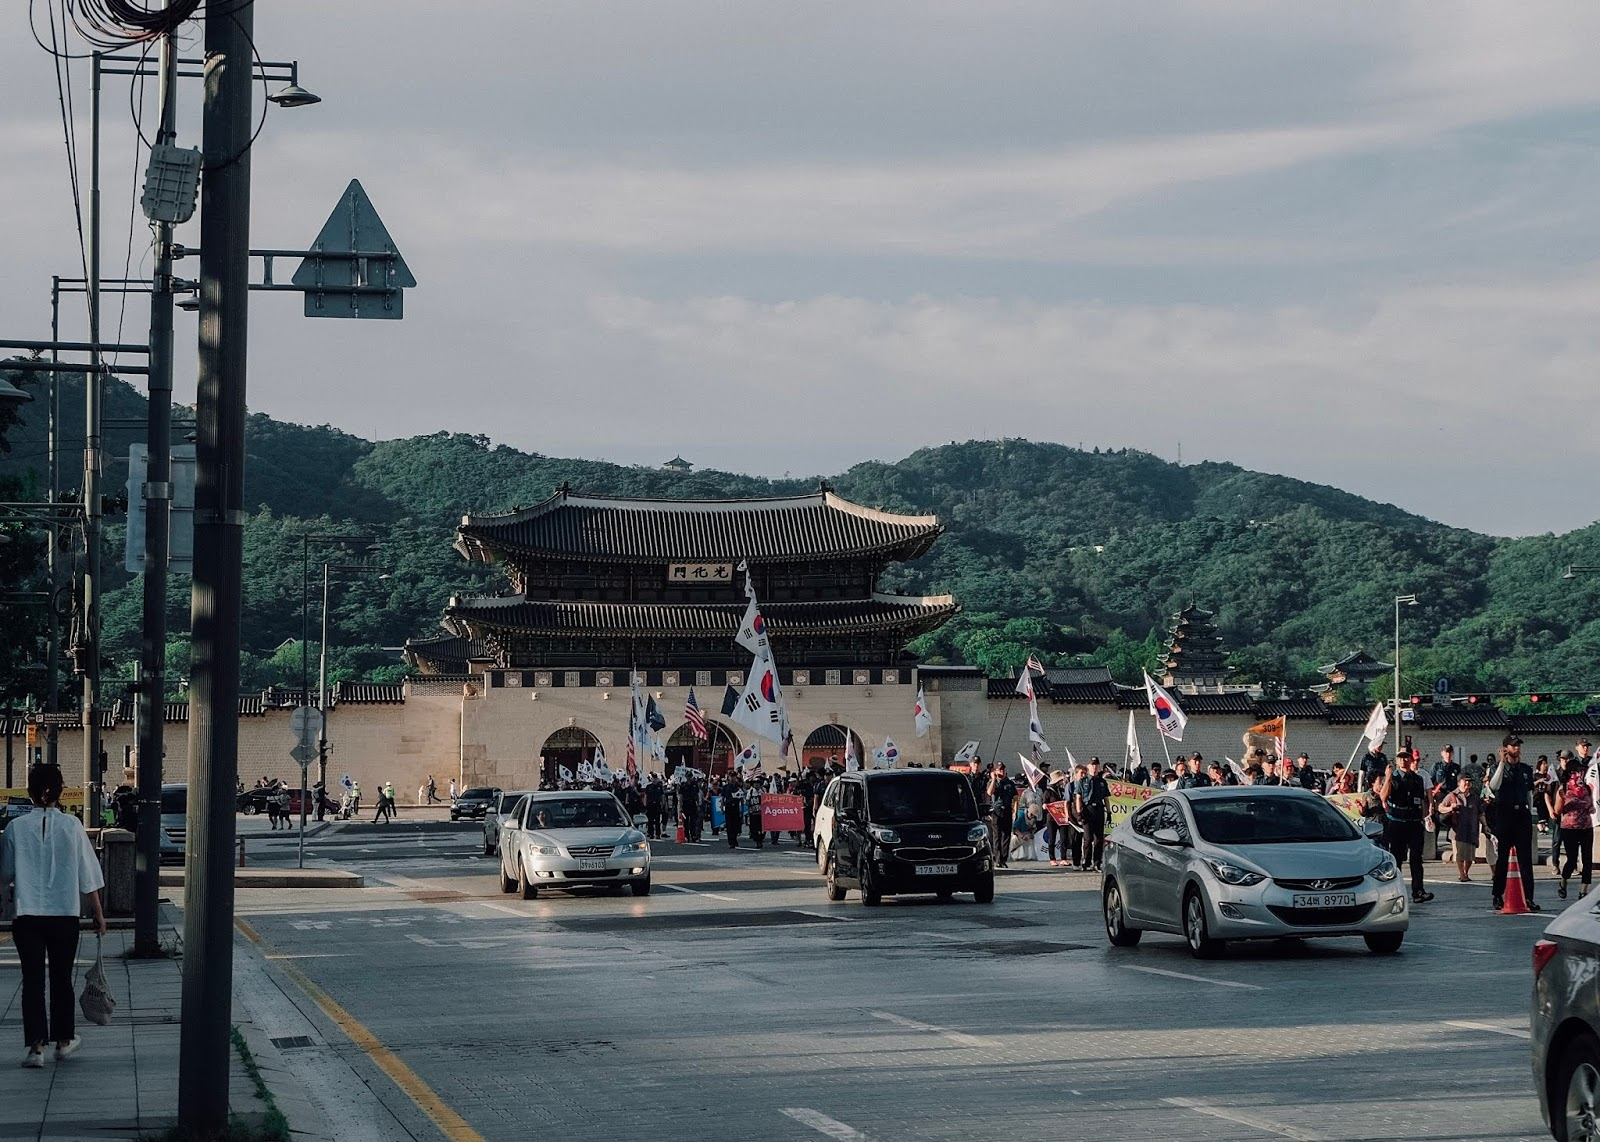 Gwanghamun Square Seoul Korea Curitan Aqalili